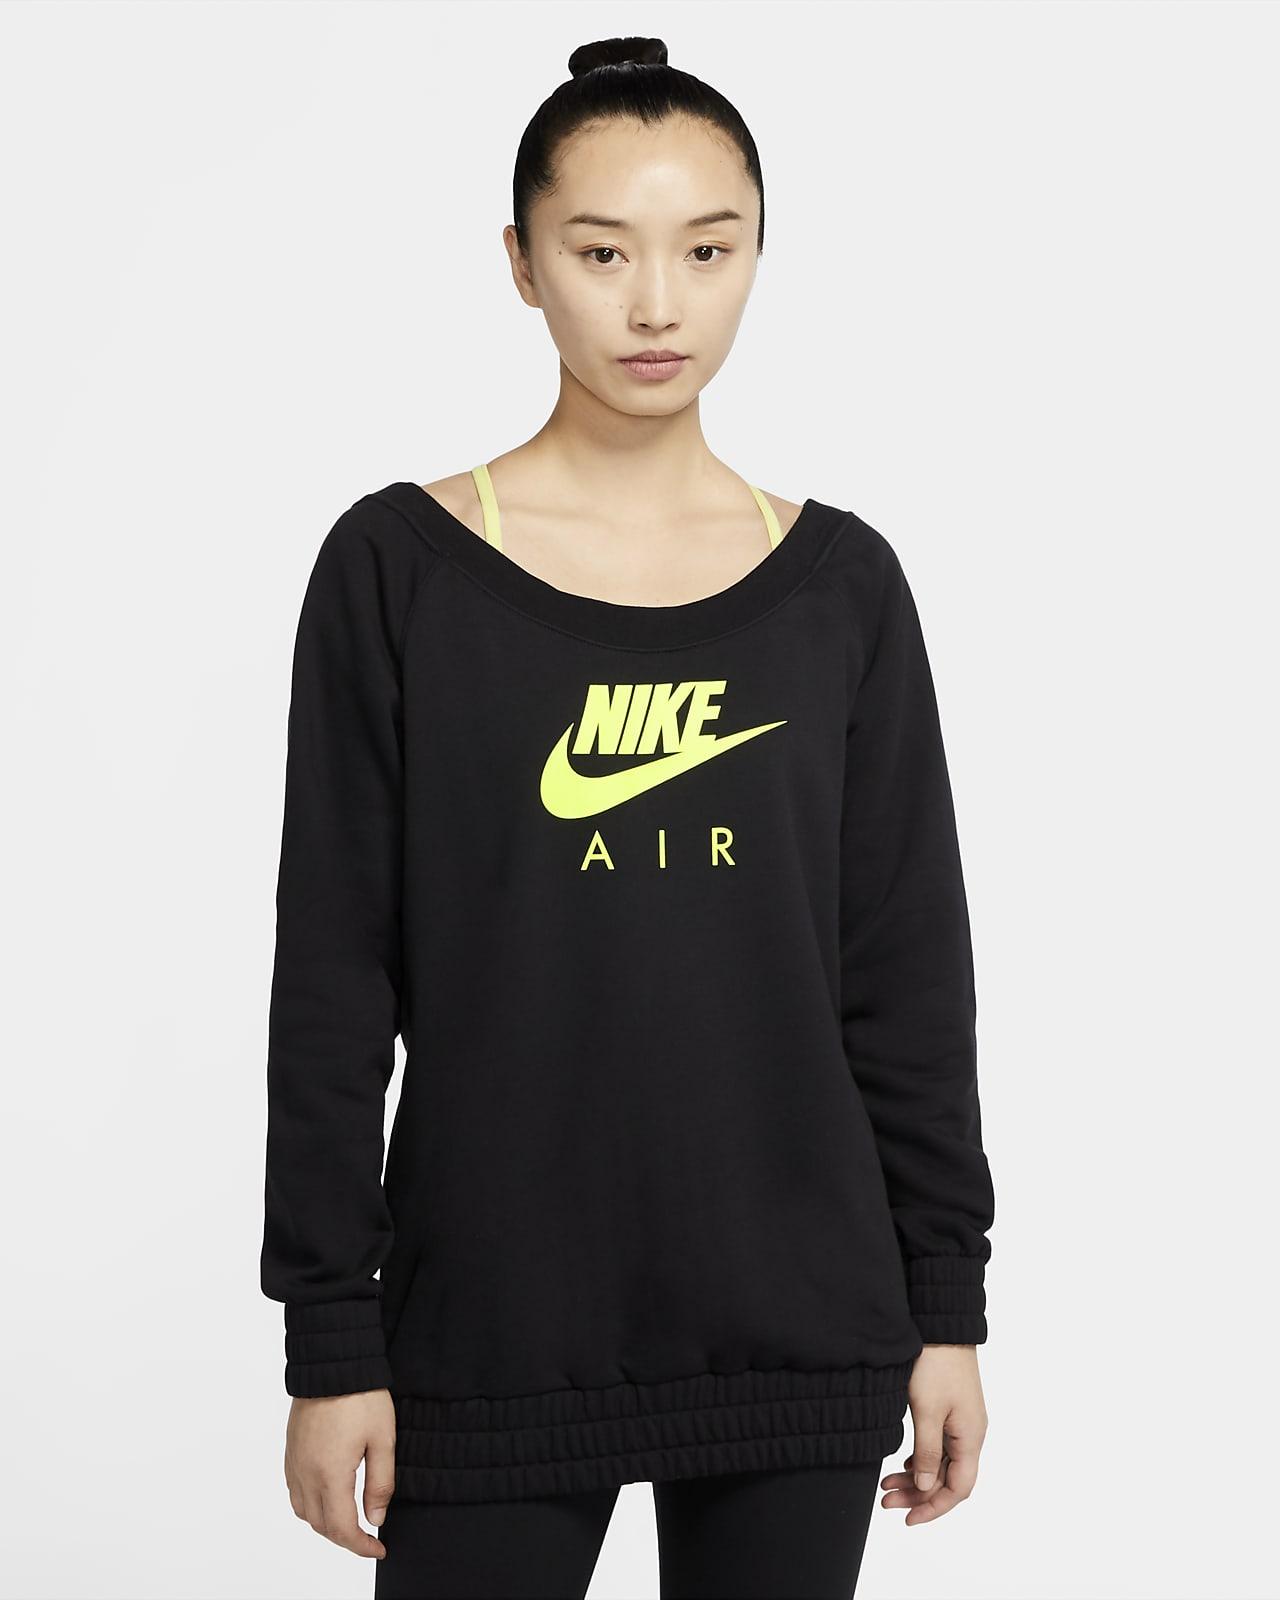 nike air clothing womens